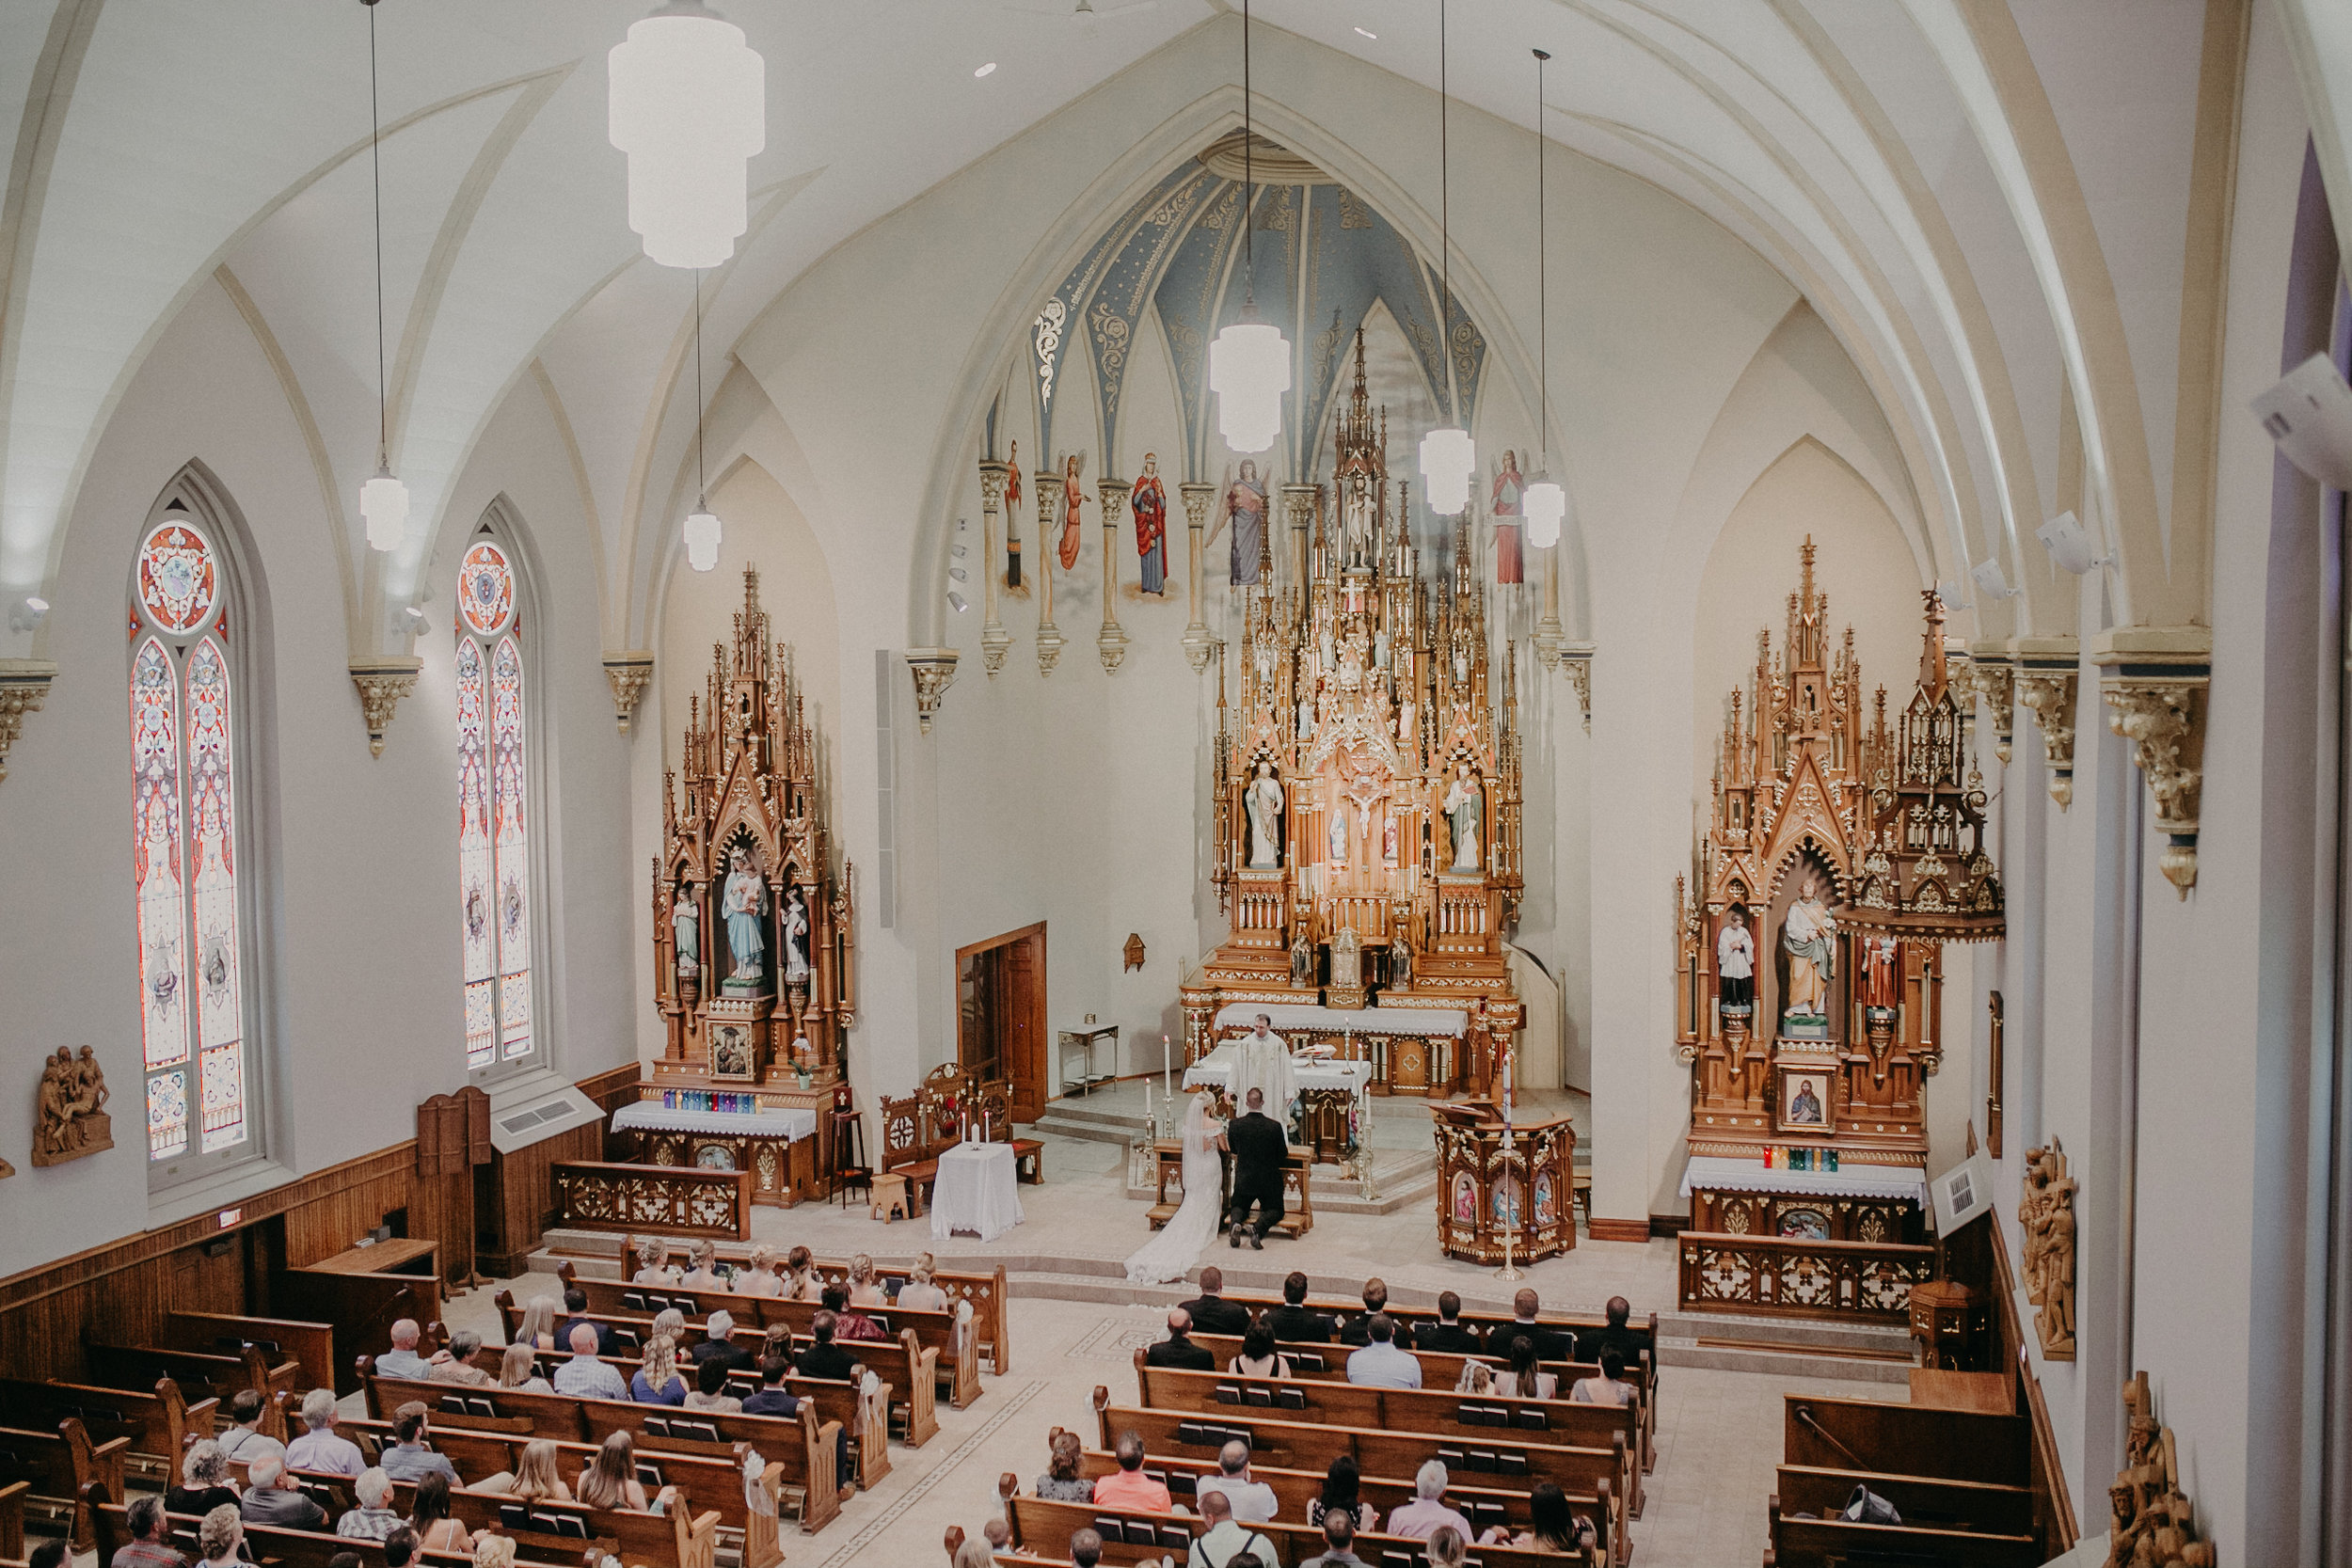 Marshfield WI wedding photographer Andrea Wagner photographs natural light in Catholic wedding ceremony